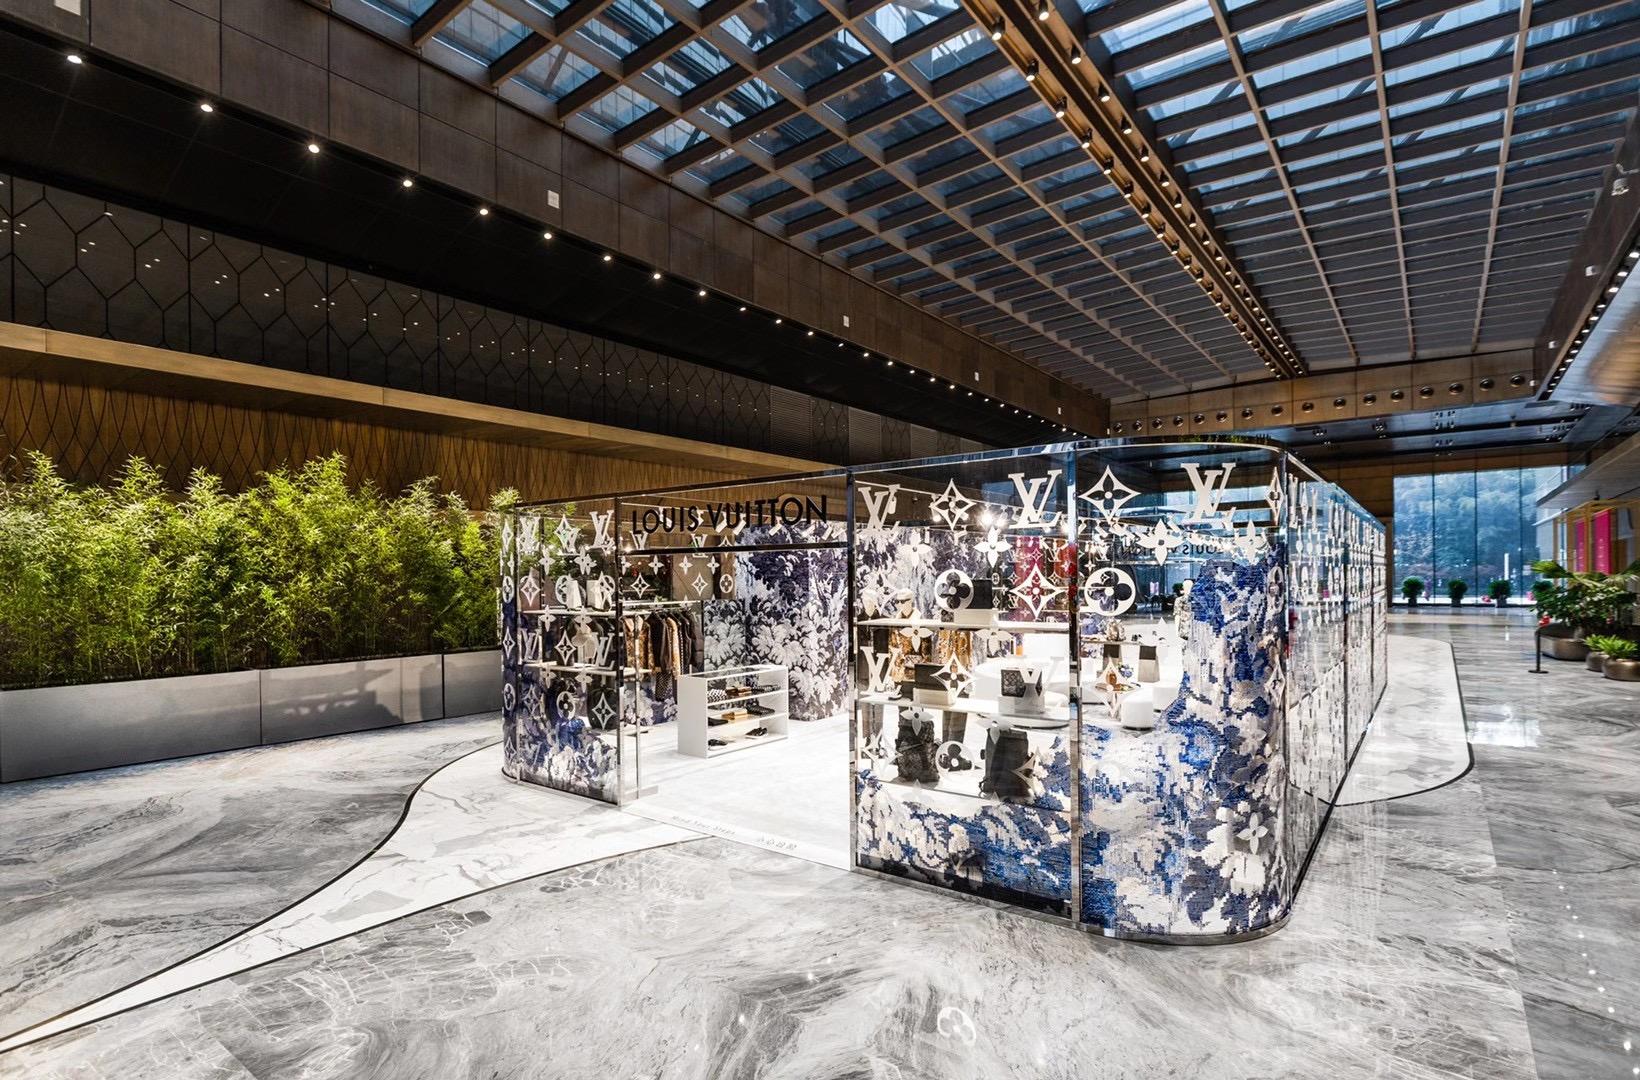 Louis Vuitton 2020 Men's Pre-Coll Pop Up Nov 13th – Dec 13th Harbin/Jinan/Xi'an – 2